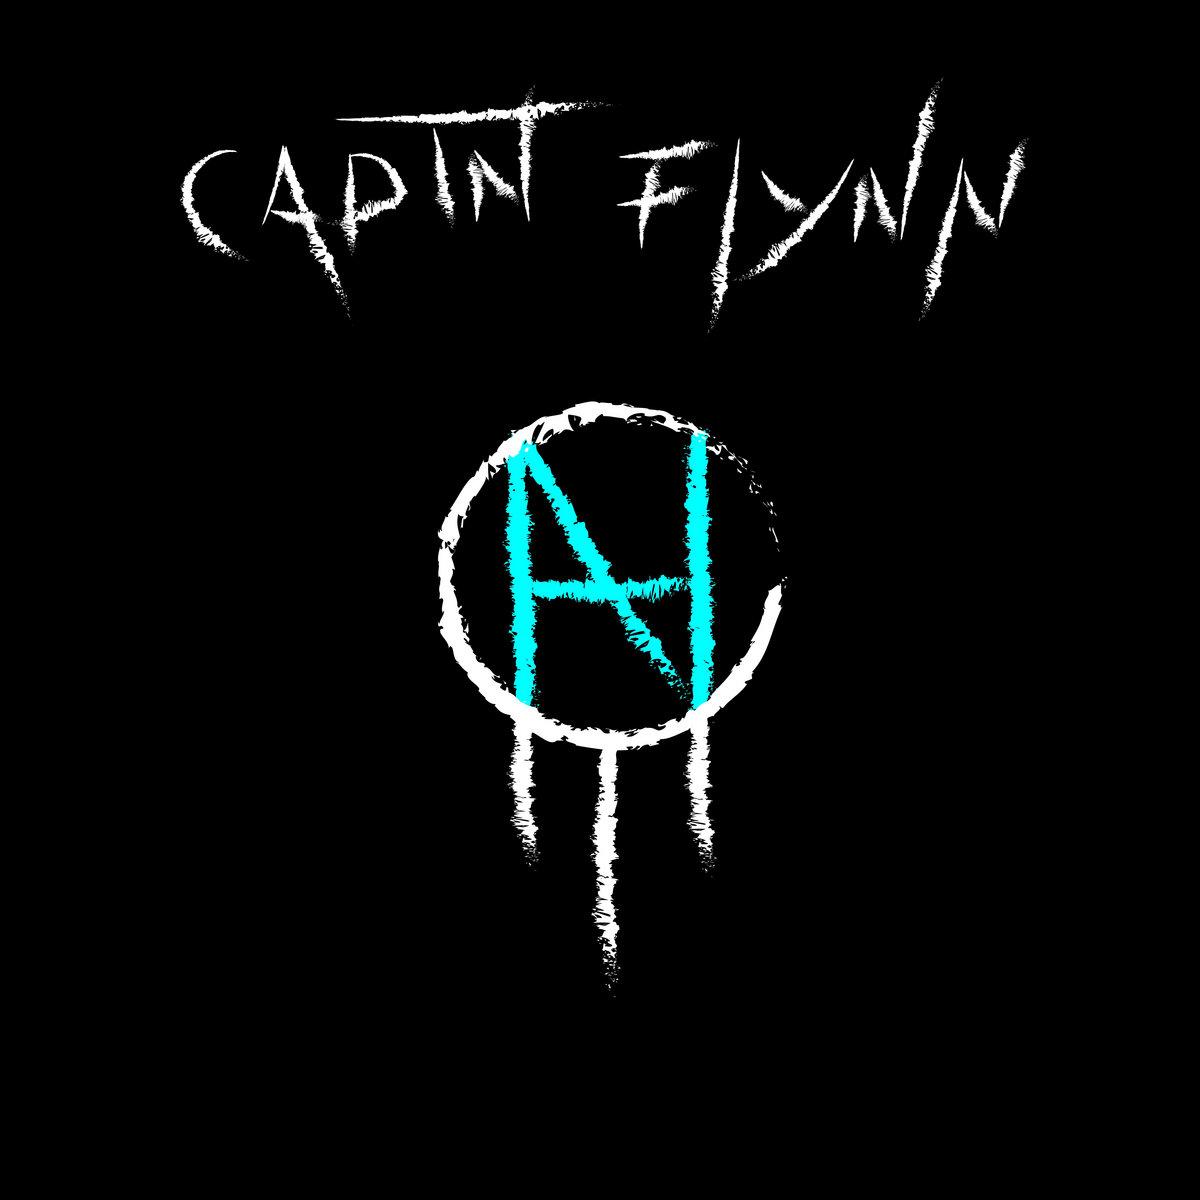 captn